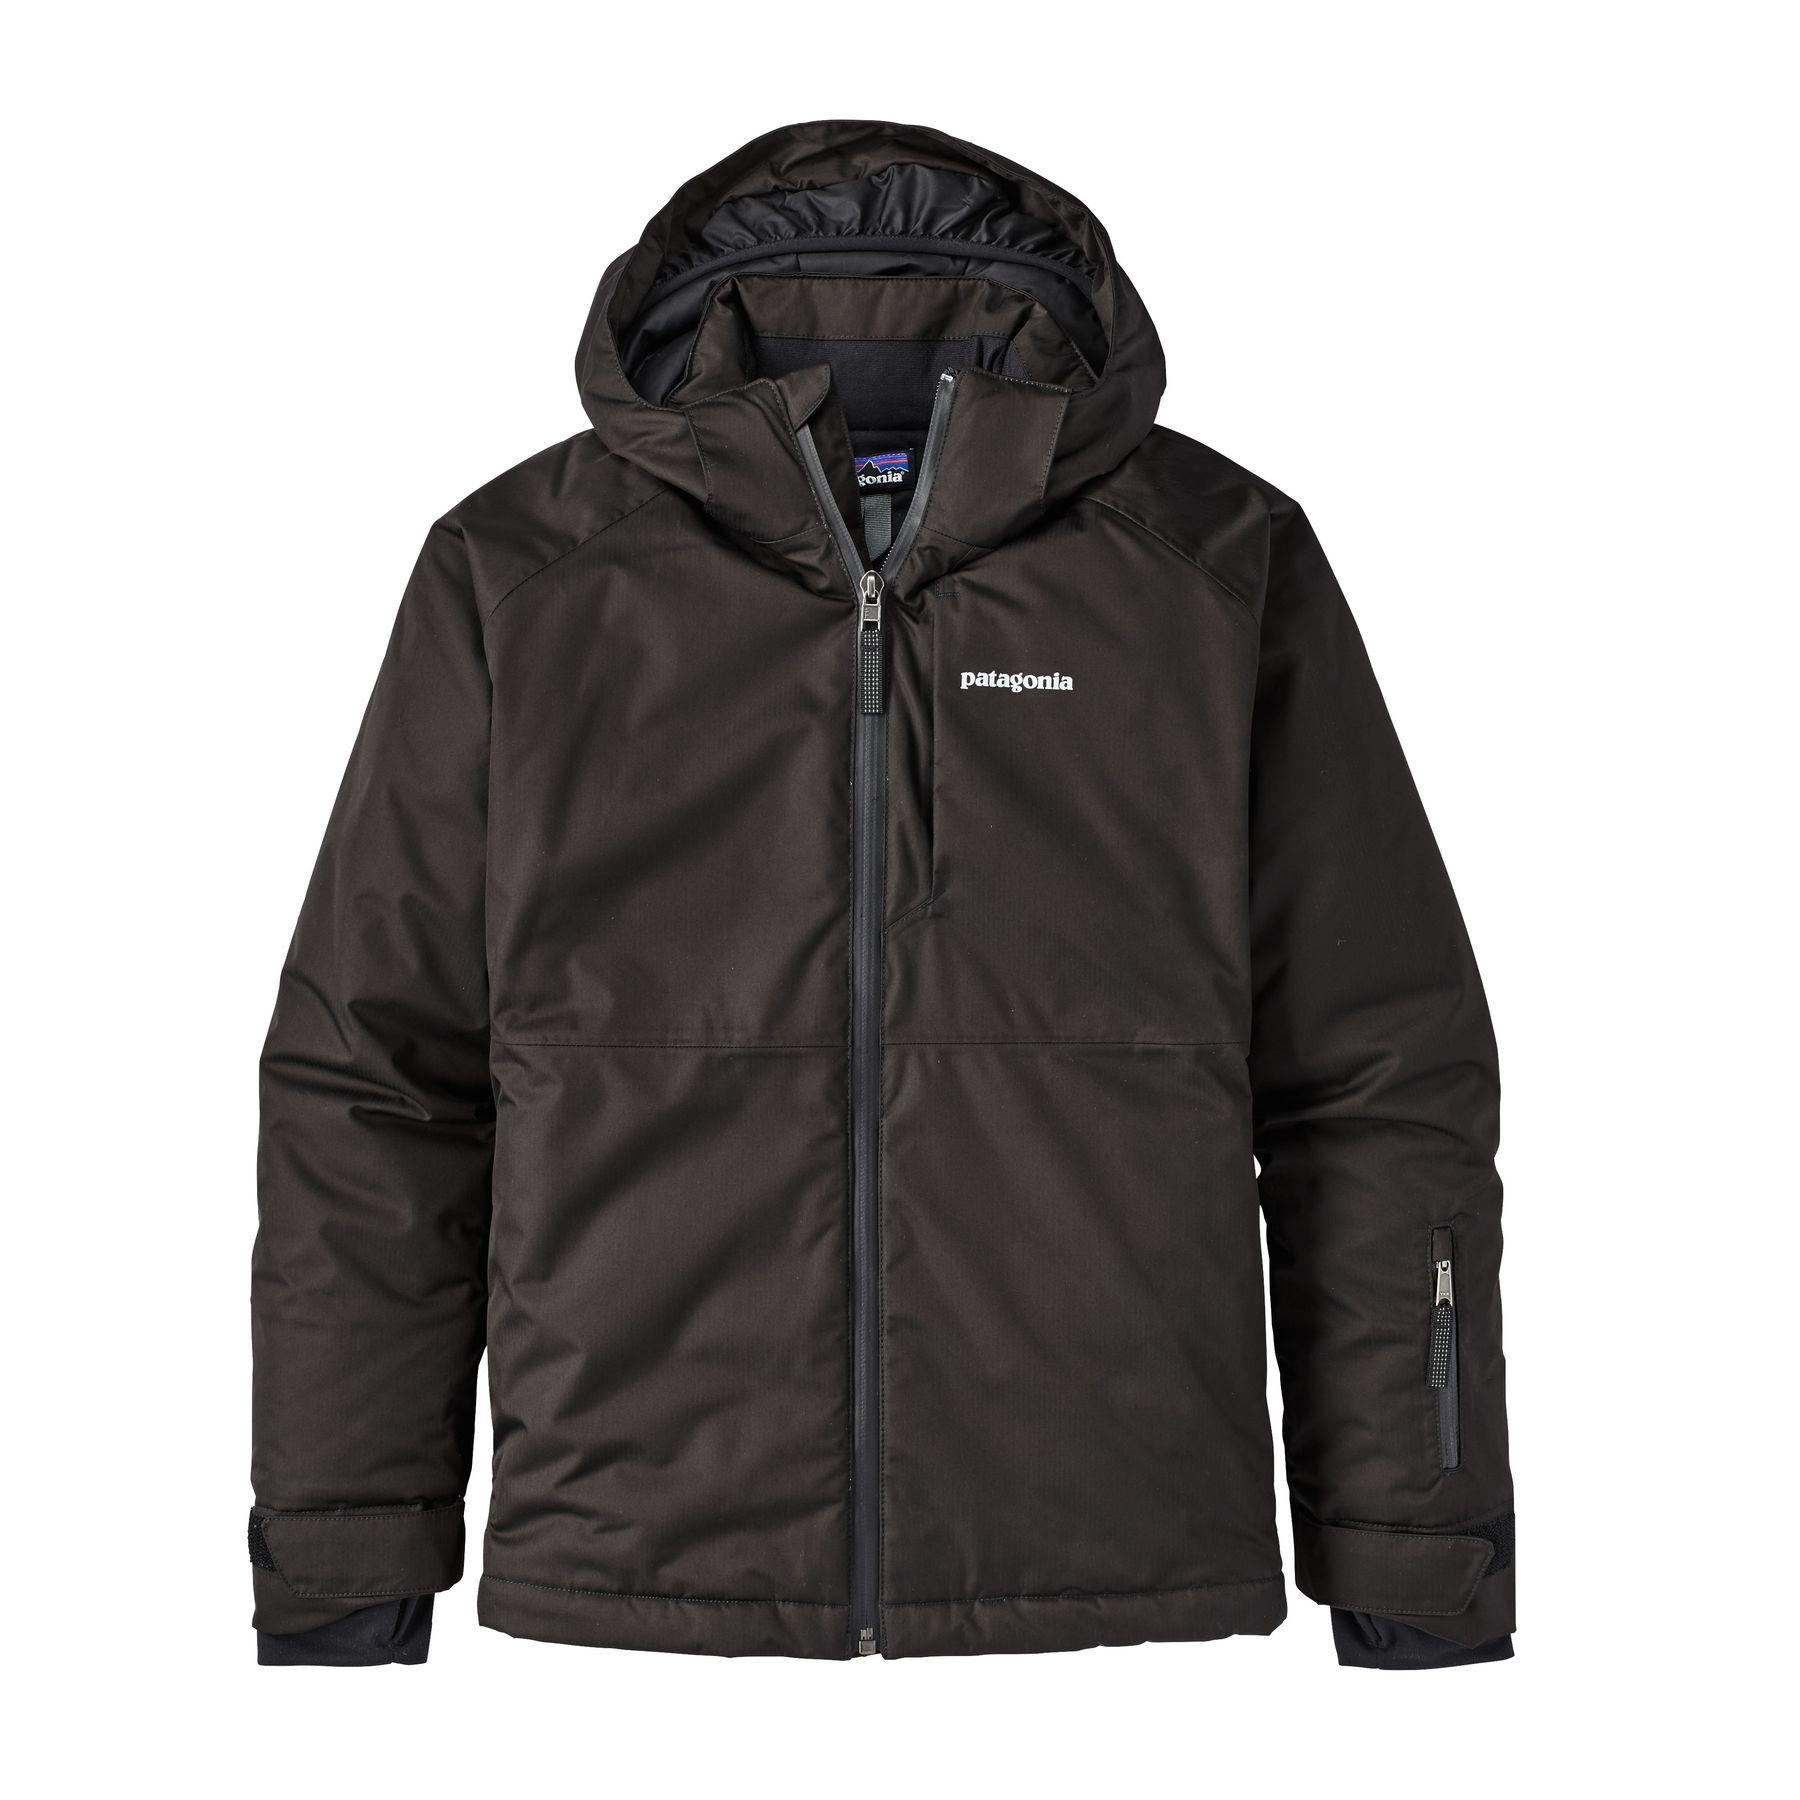 Patagonia Boys' Snowshot Jacket - Veste garçon